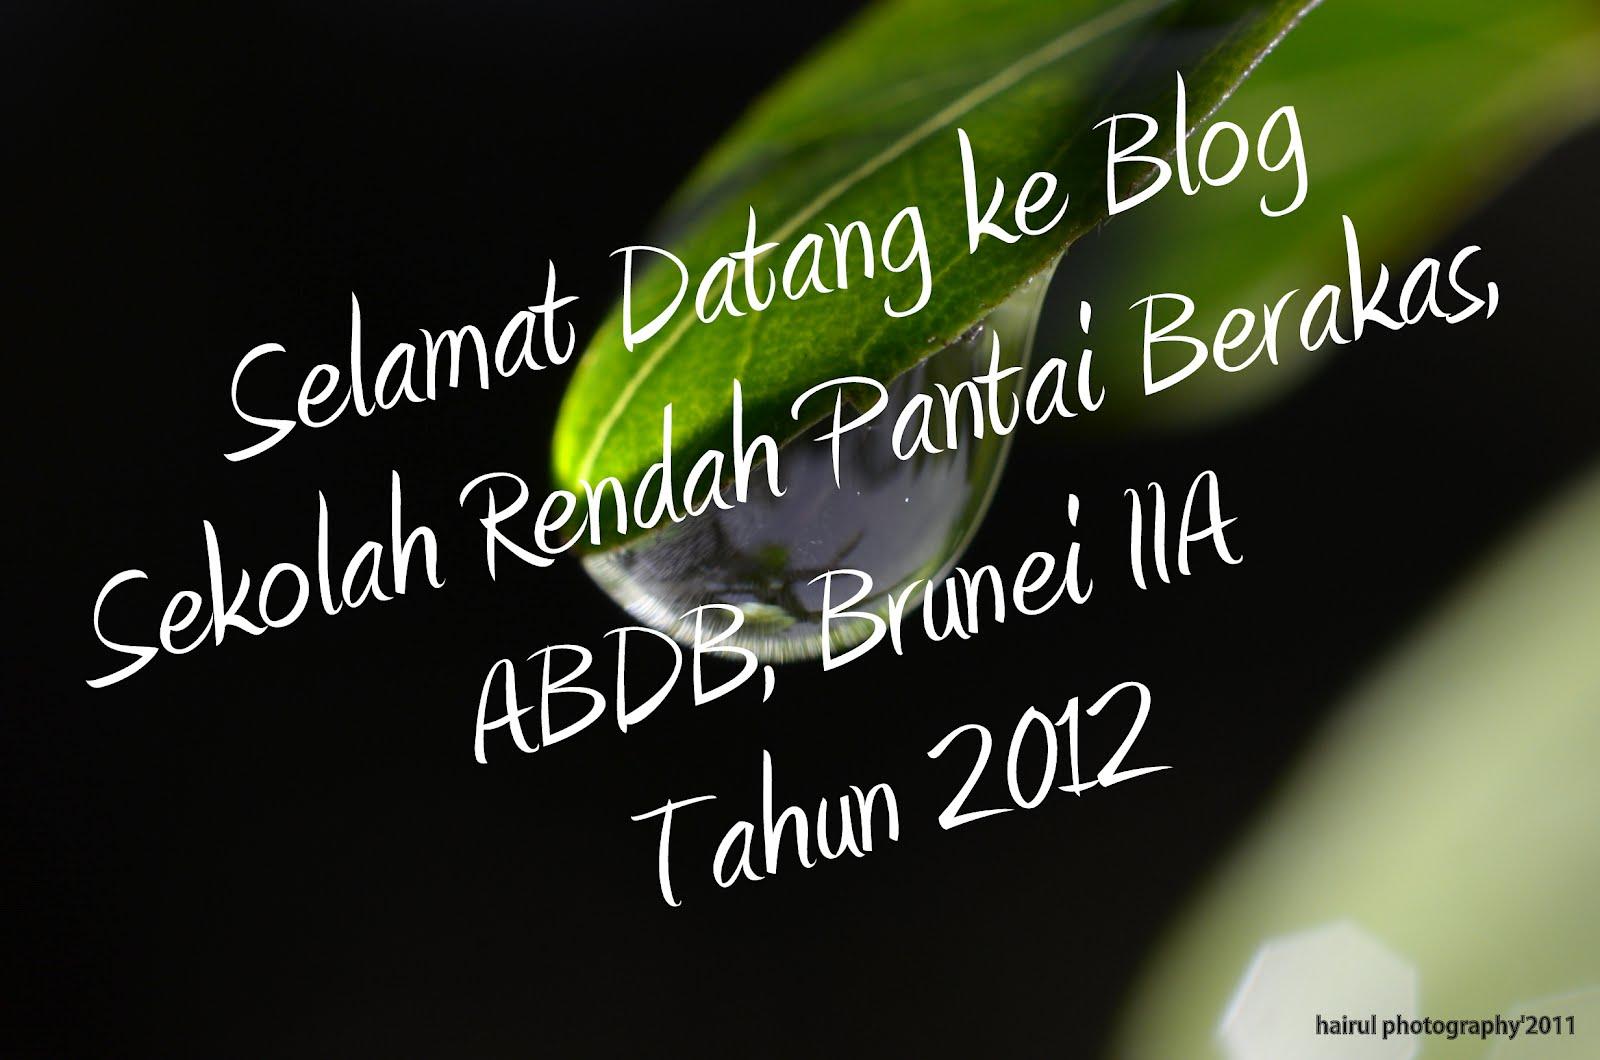 Sr. Pantai Berakas, ABDB, Brunei IIA